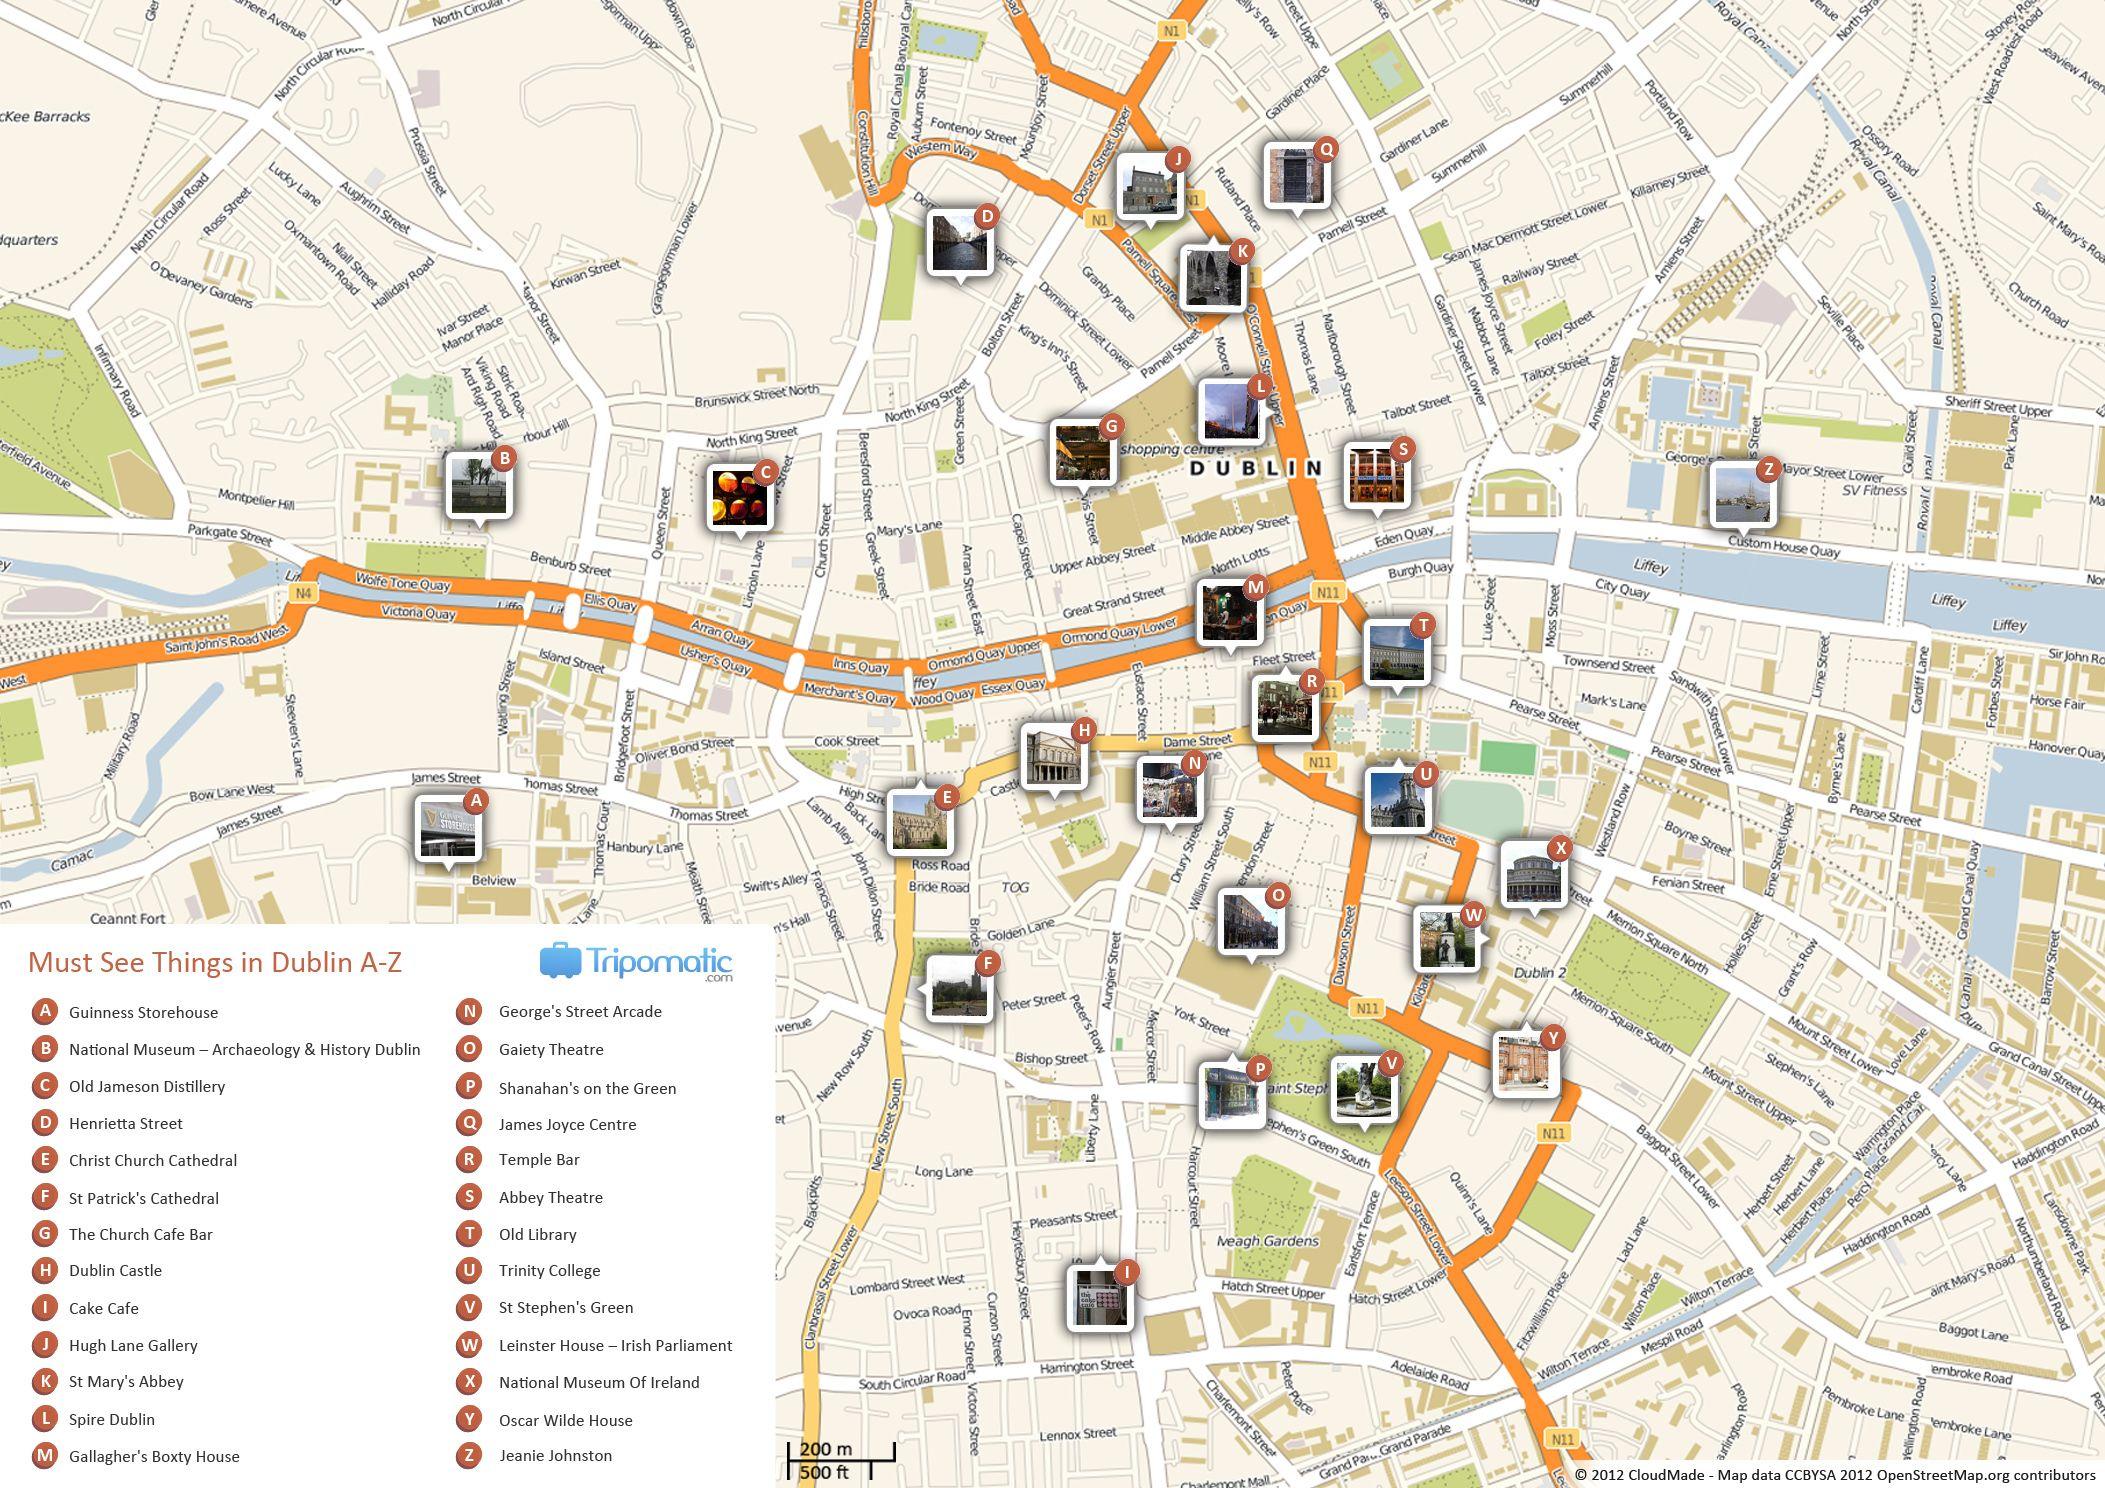 Map Of Dublin Ireland And Surrounding Area.Dublin Printable Tourist Map In 2019 Free Tourist Maps Dublin